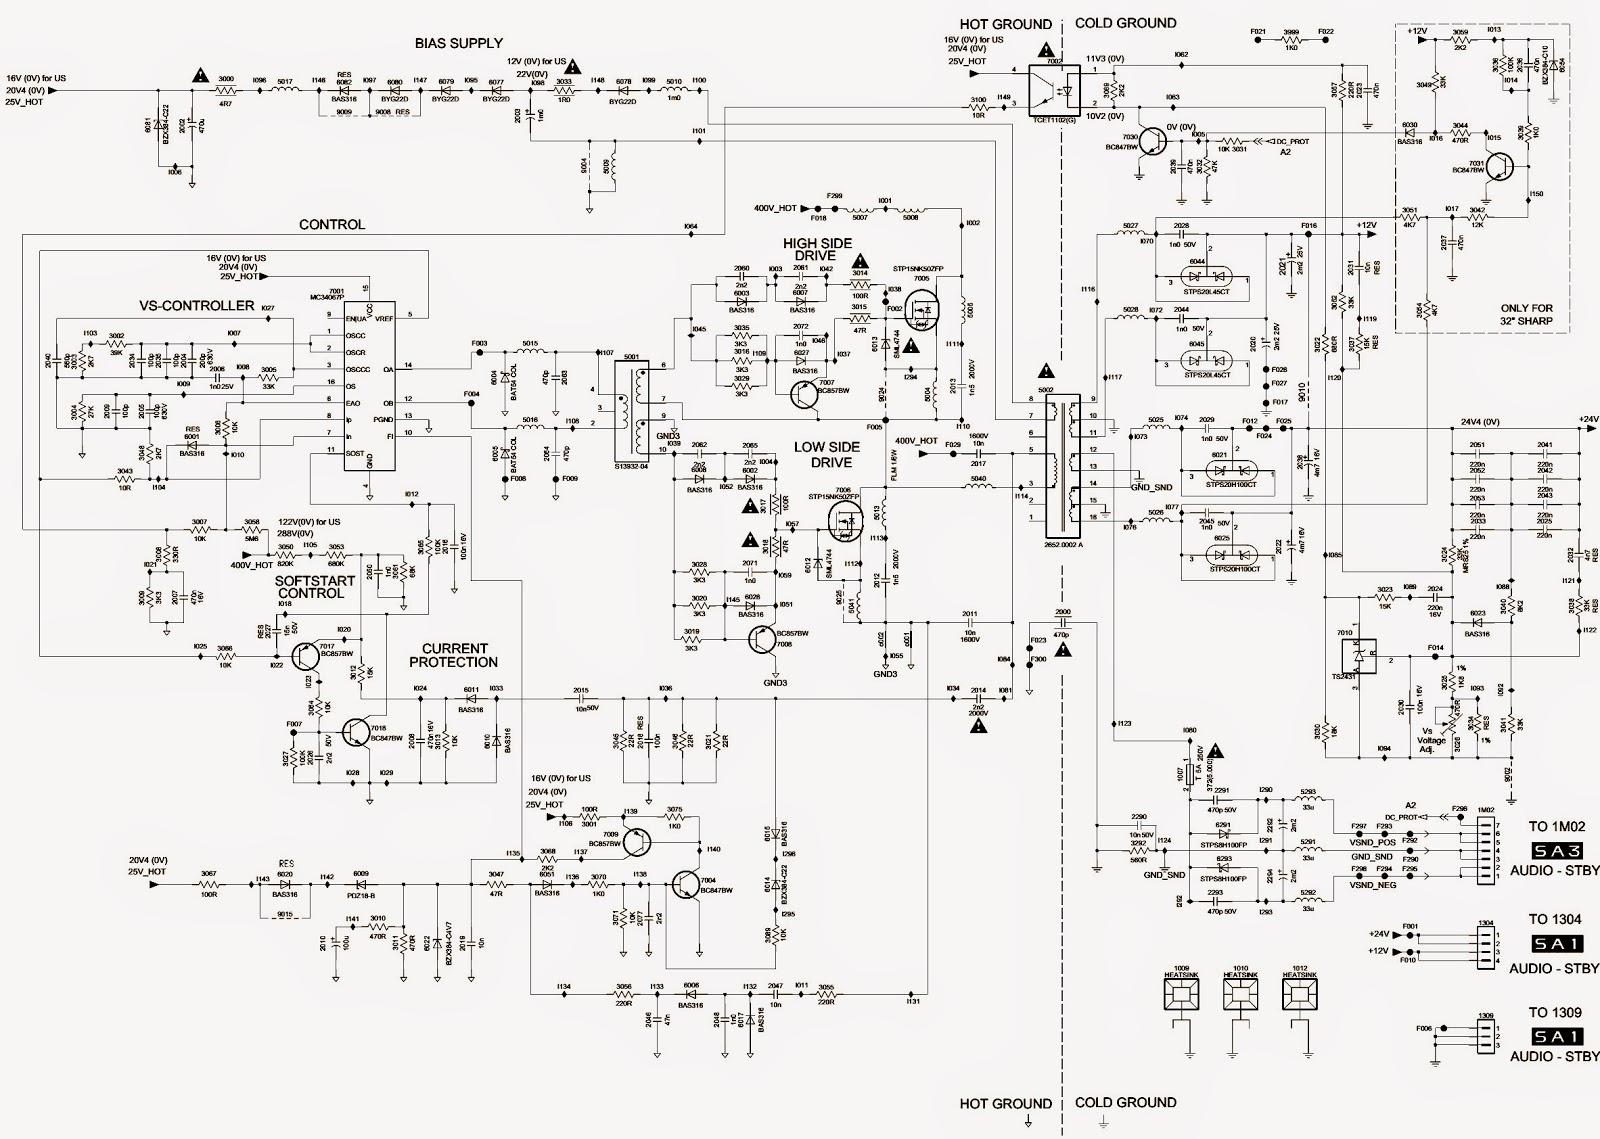 philips power vision tv circuit diagram